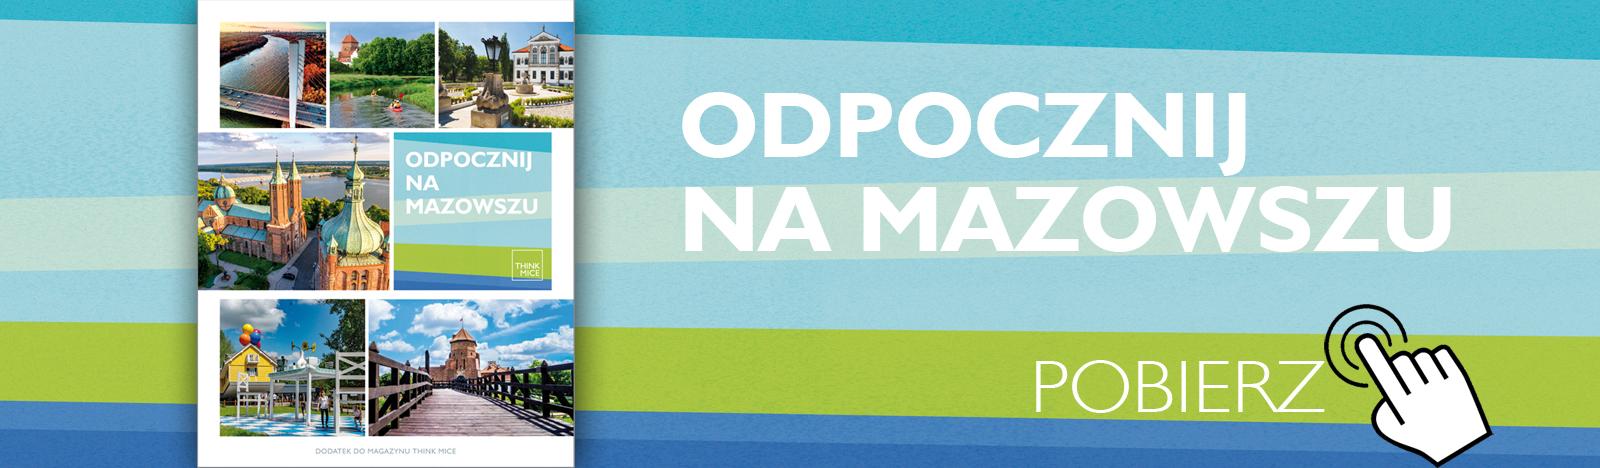 Dodatek-Mazowsze-2021-news